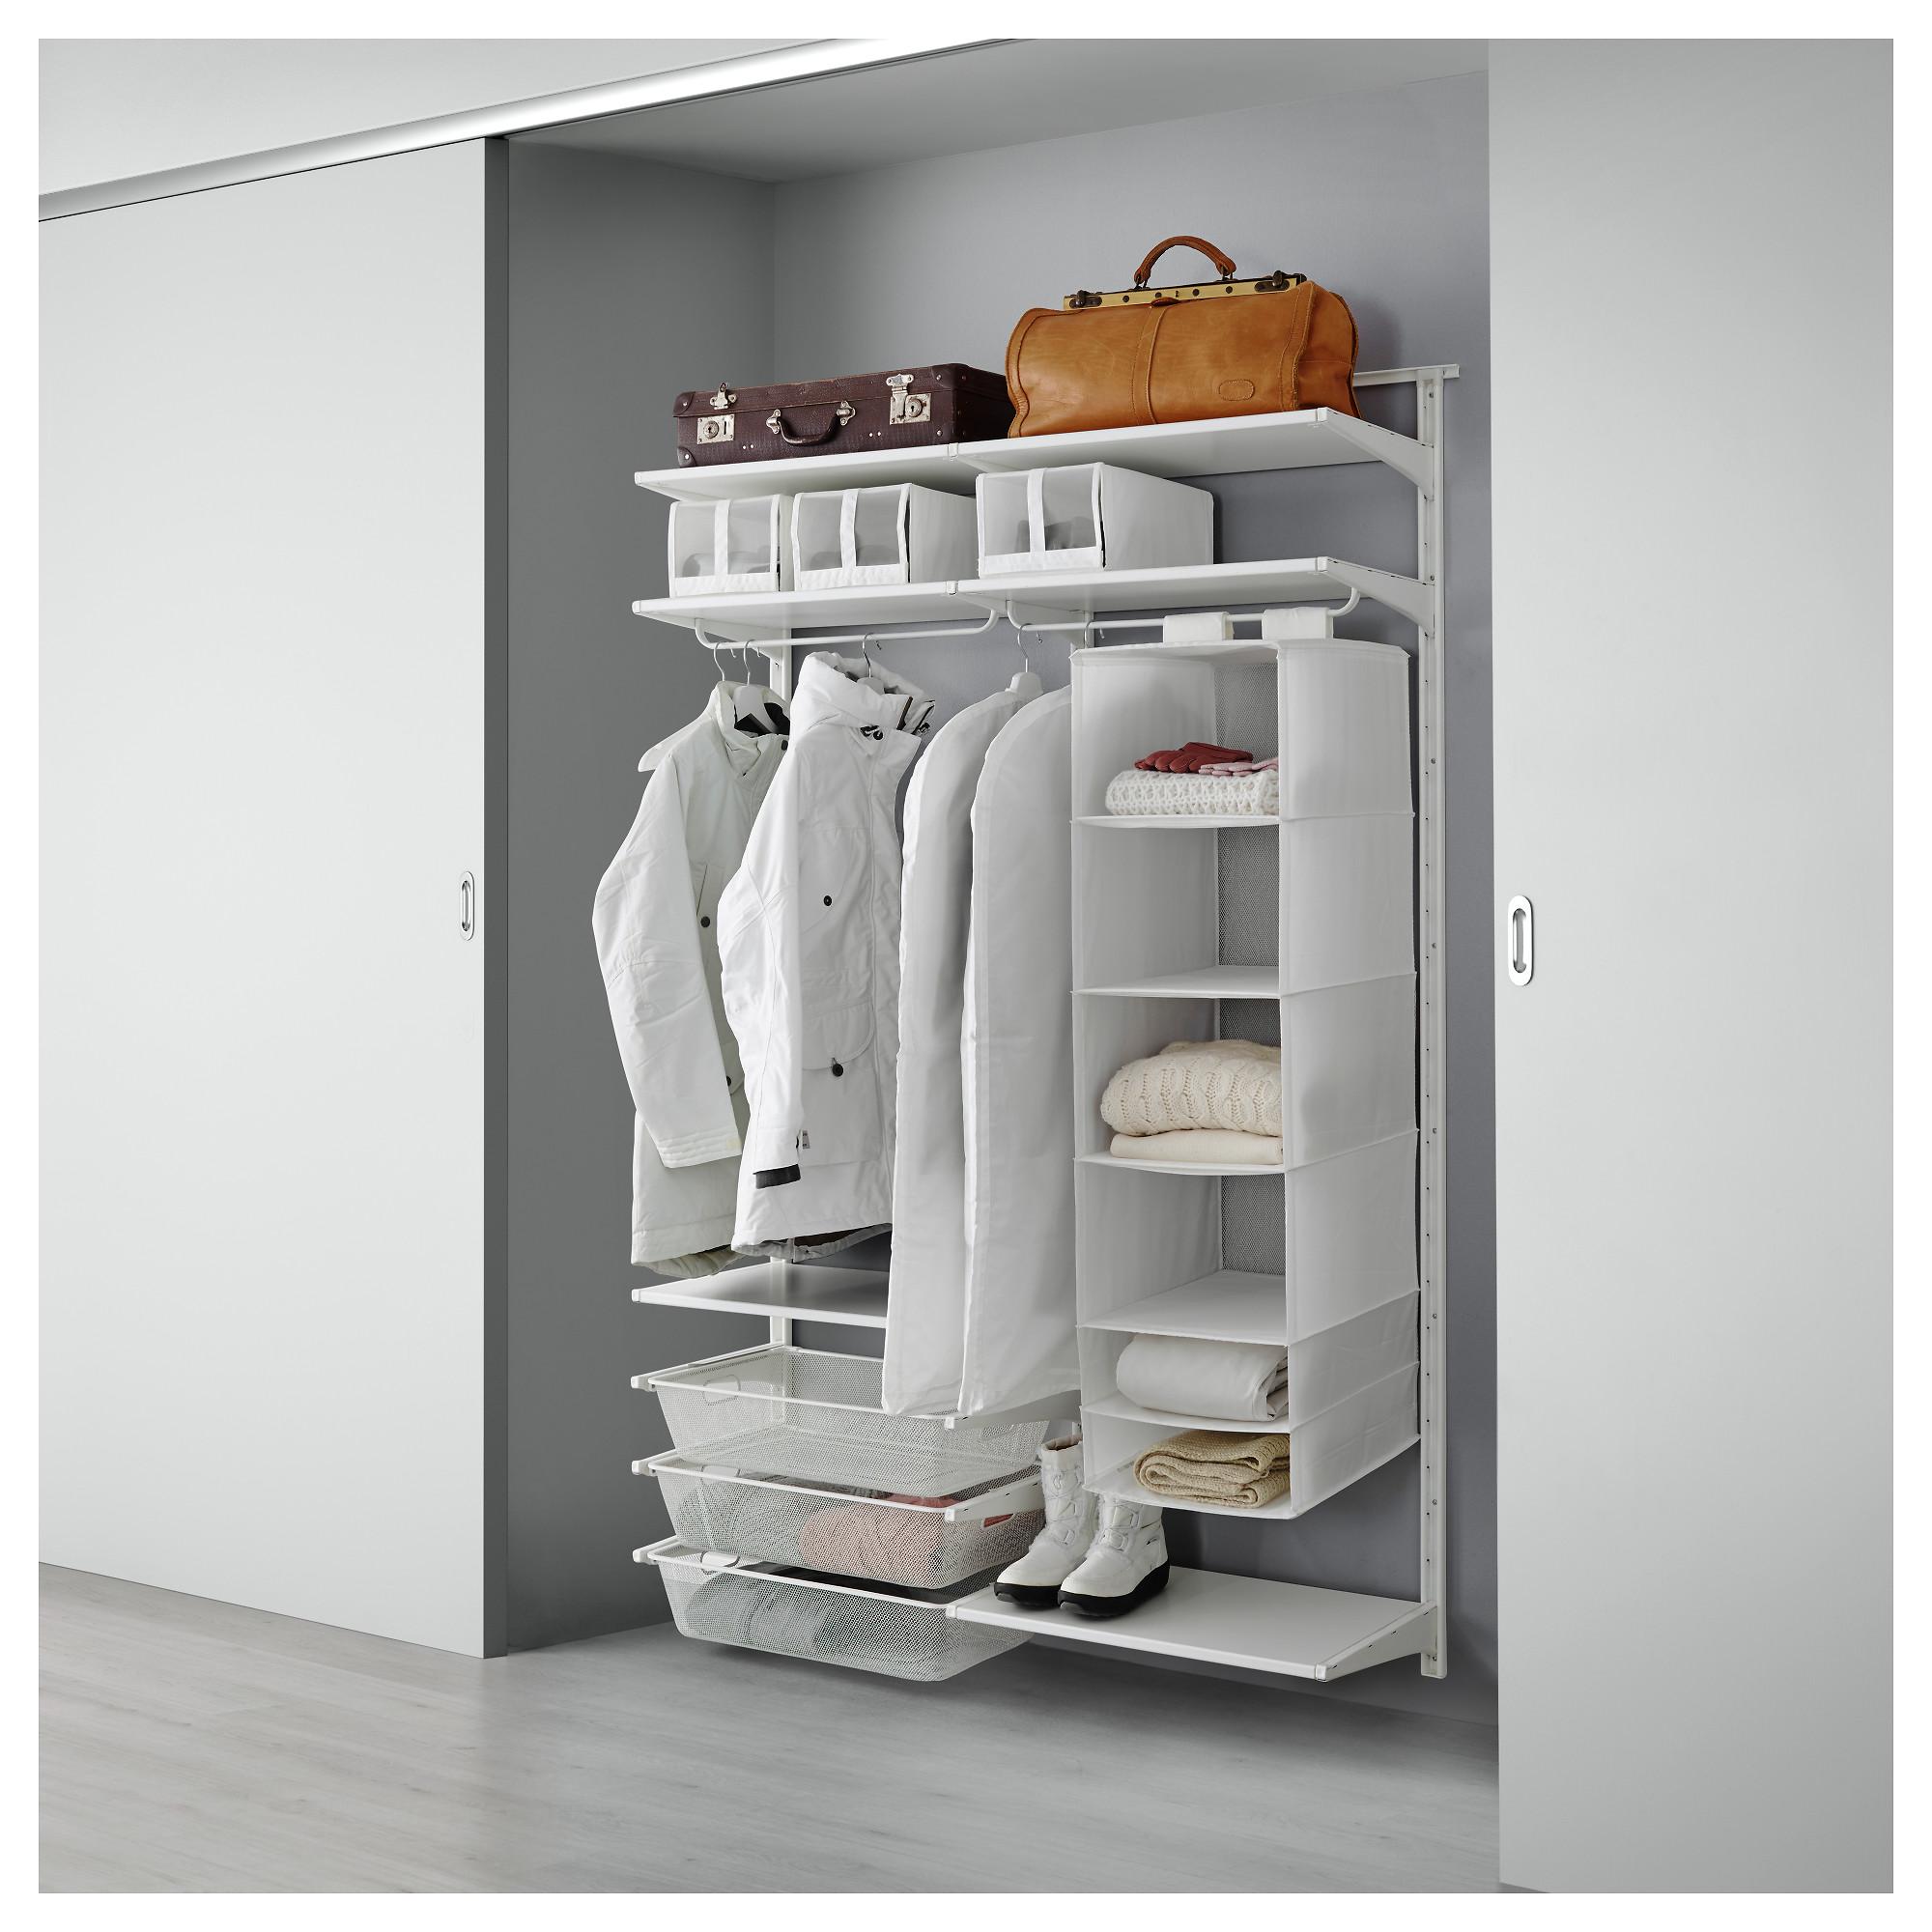 Cabina Armadio Algot Ikea.Algot